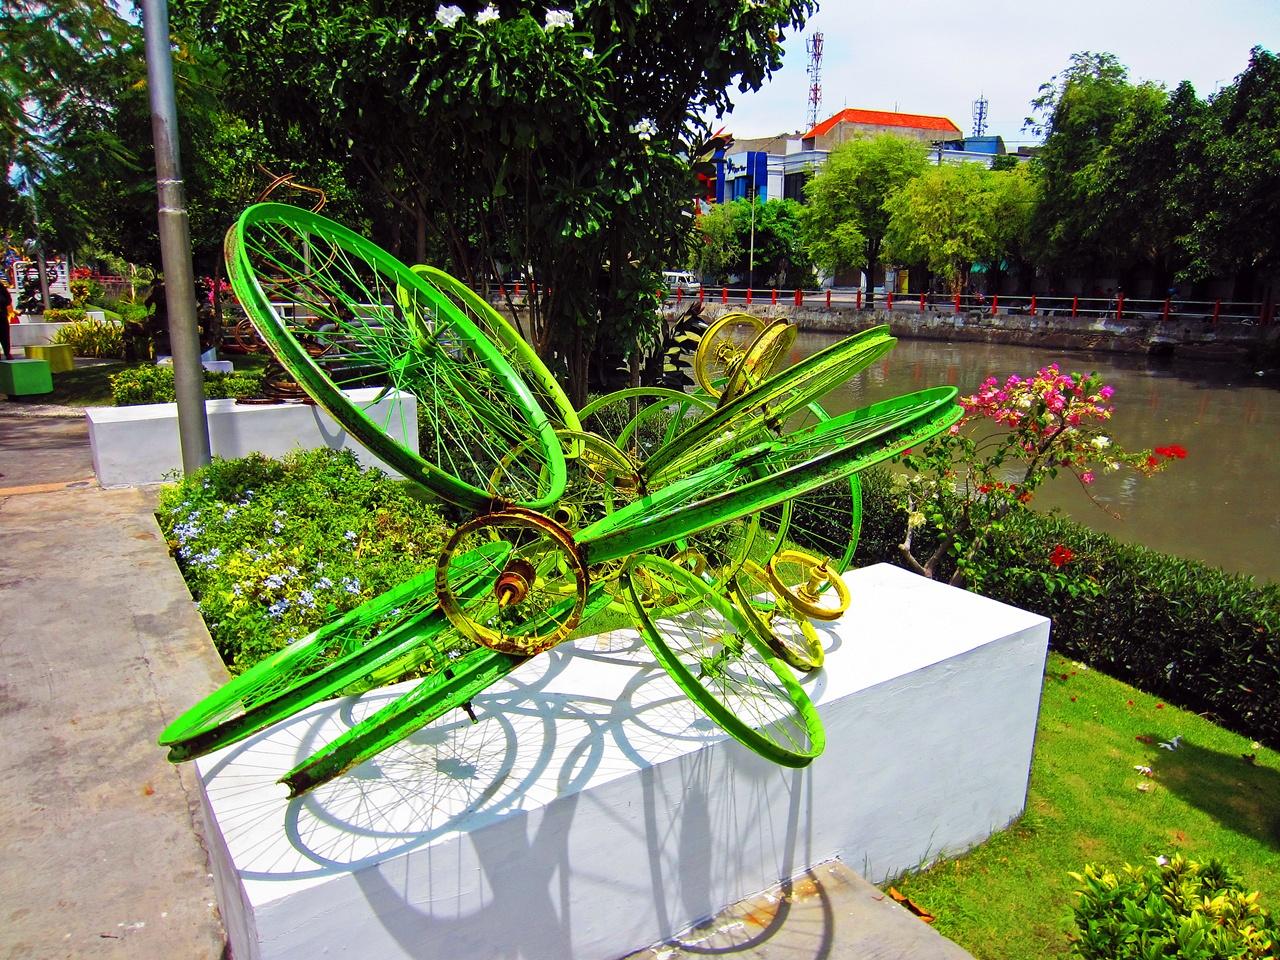 Wisata Taman Kota Surabaya Ekspresi World Roda Sepeda Dimodifikasi Mundu